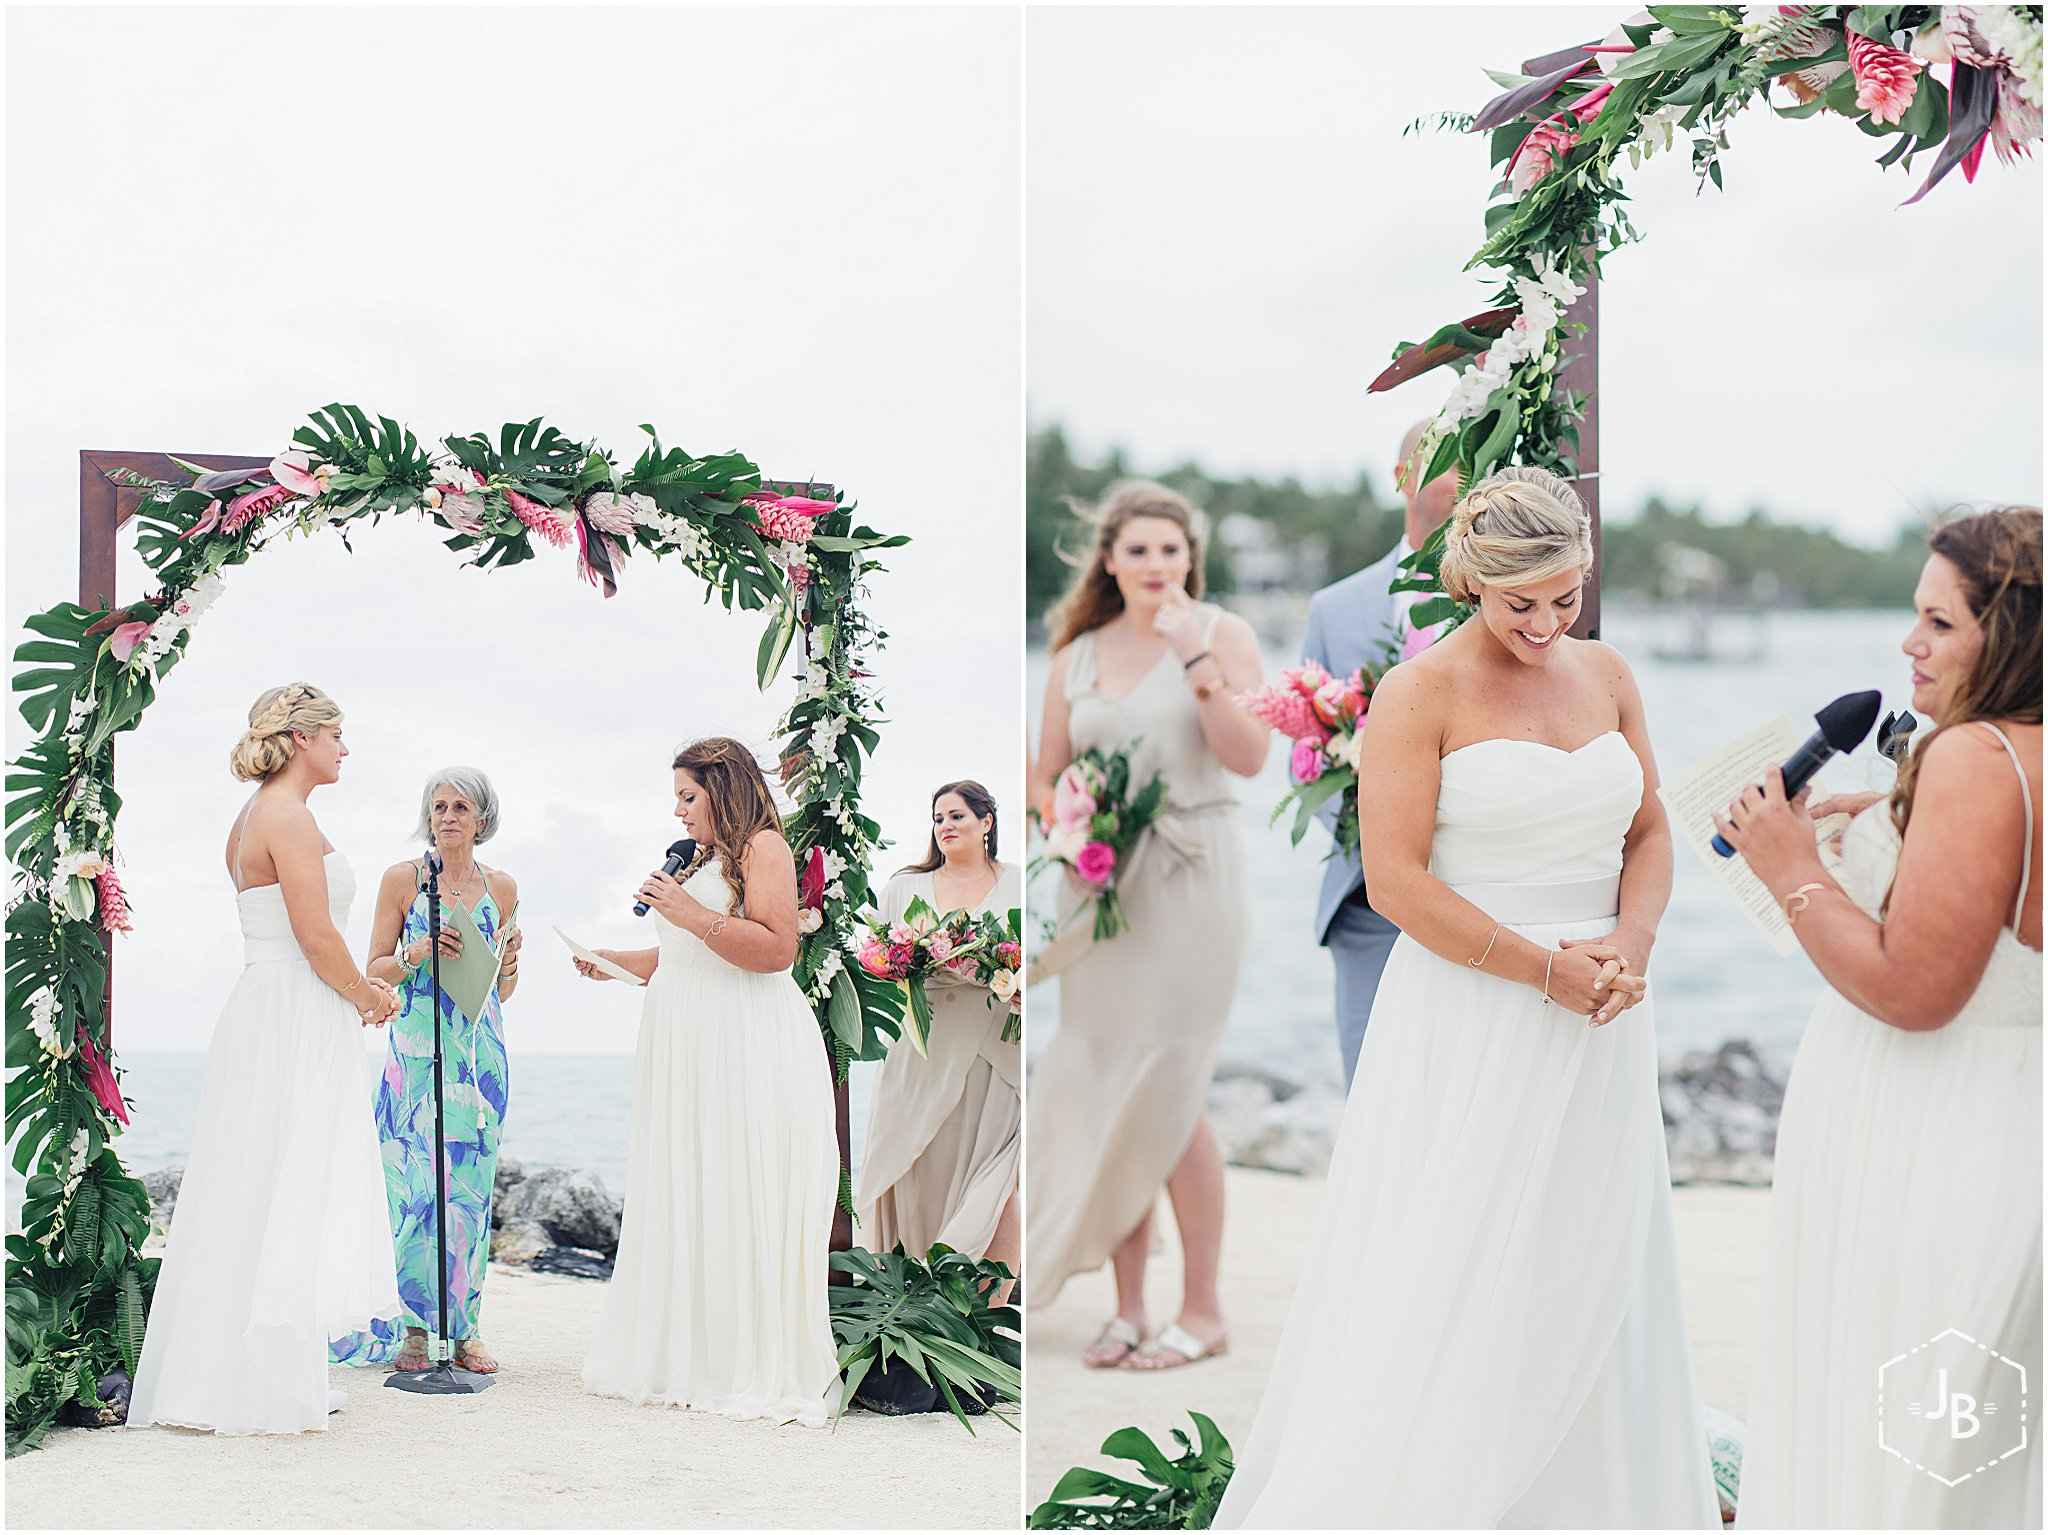 WeddingandEngagementFloridaPhotographer_1469.jpg